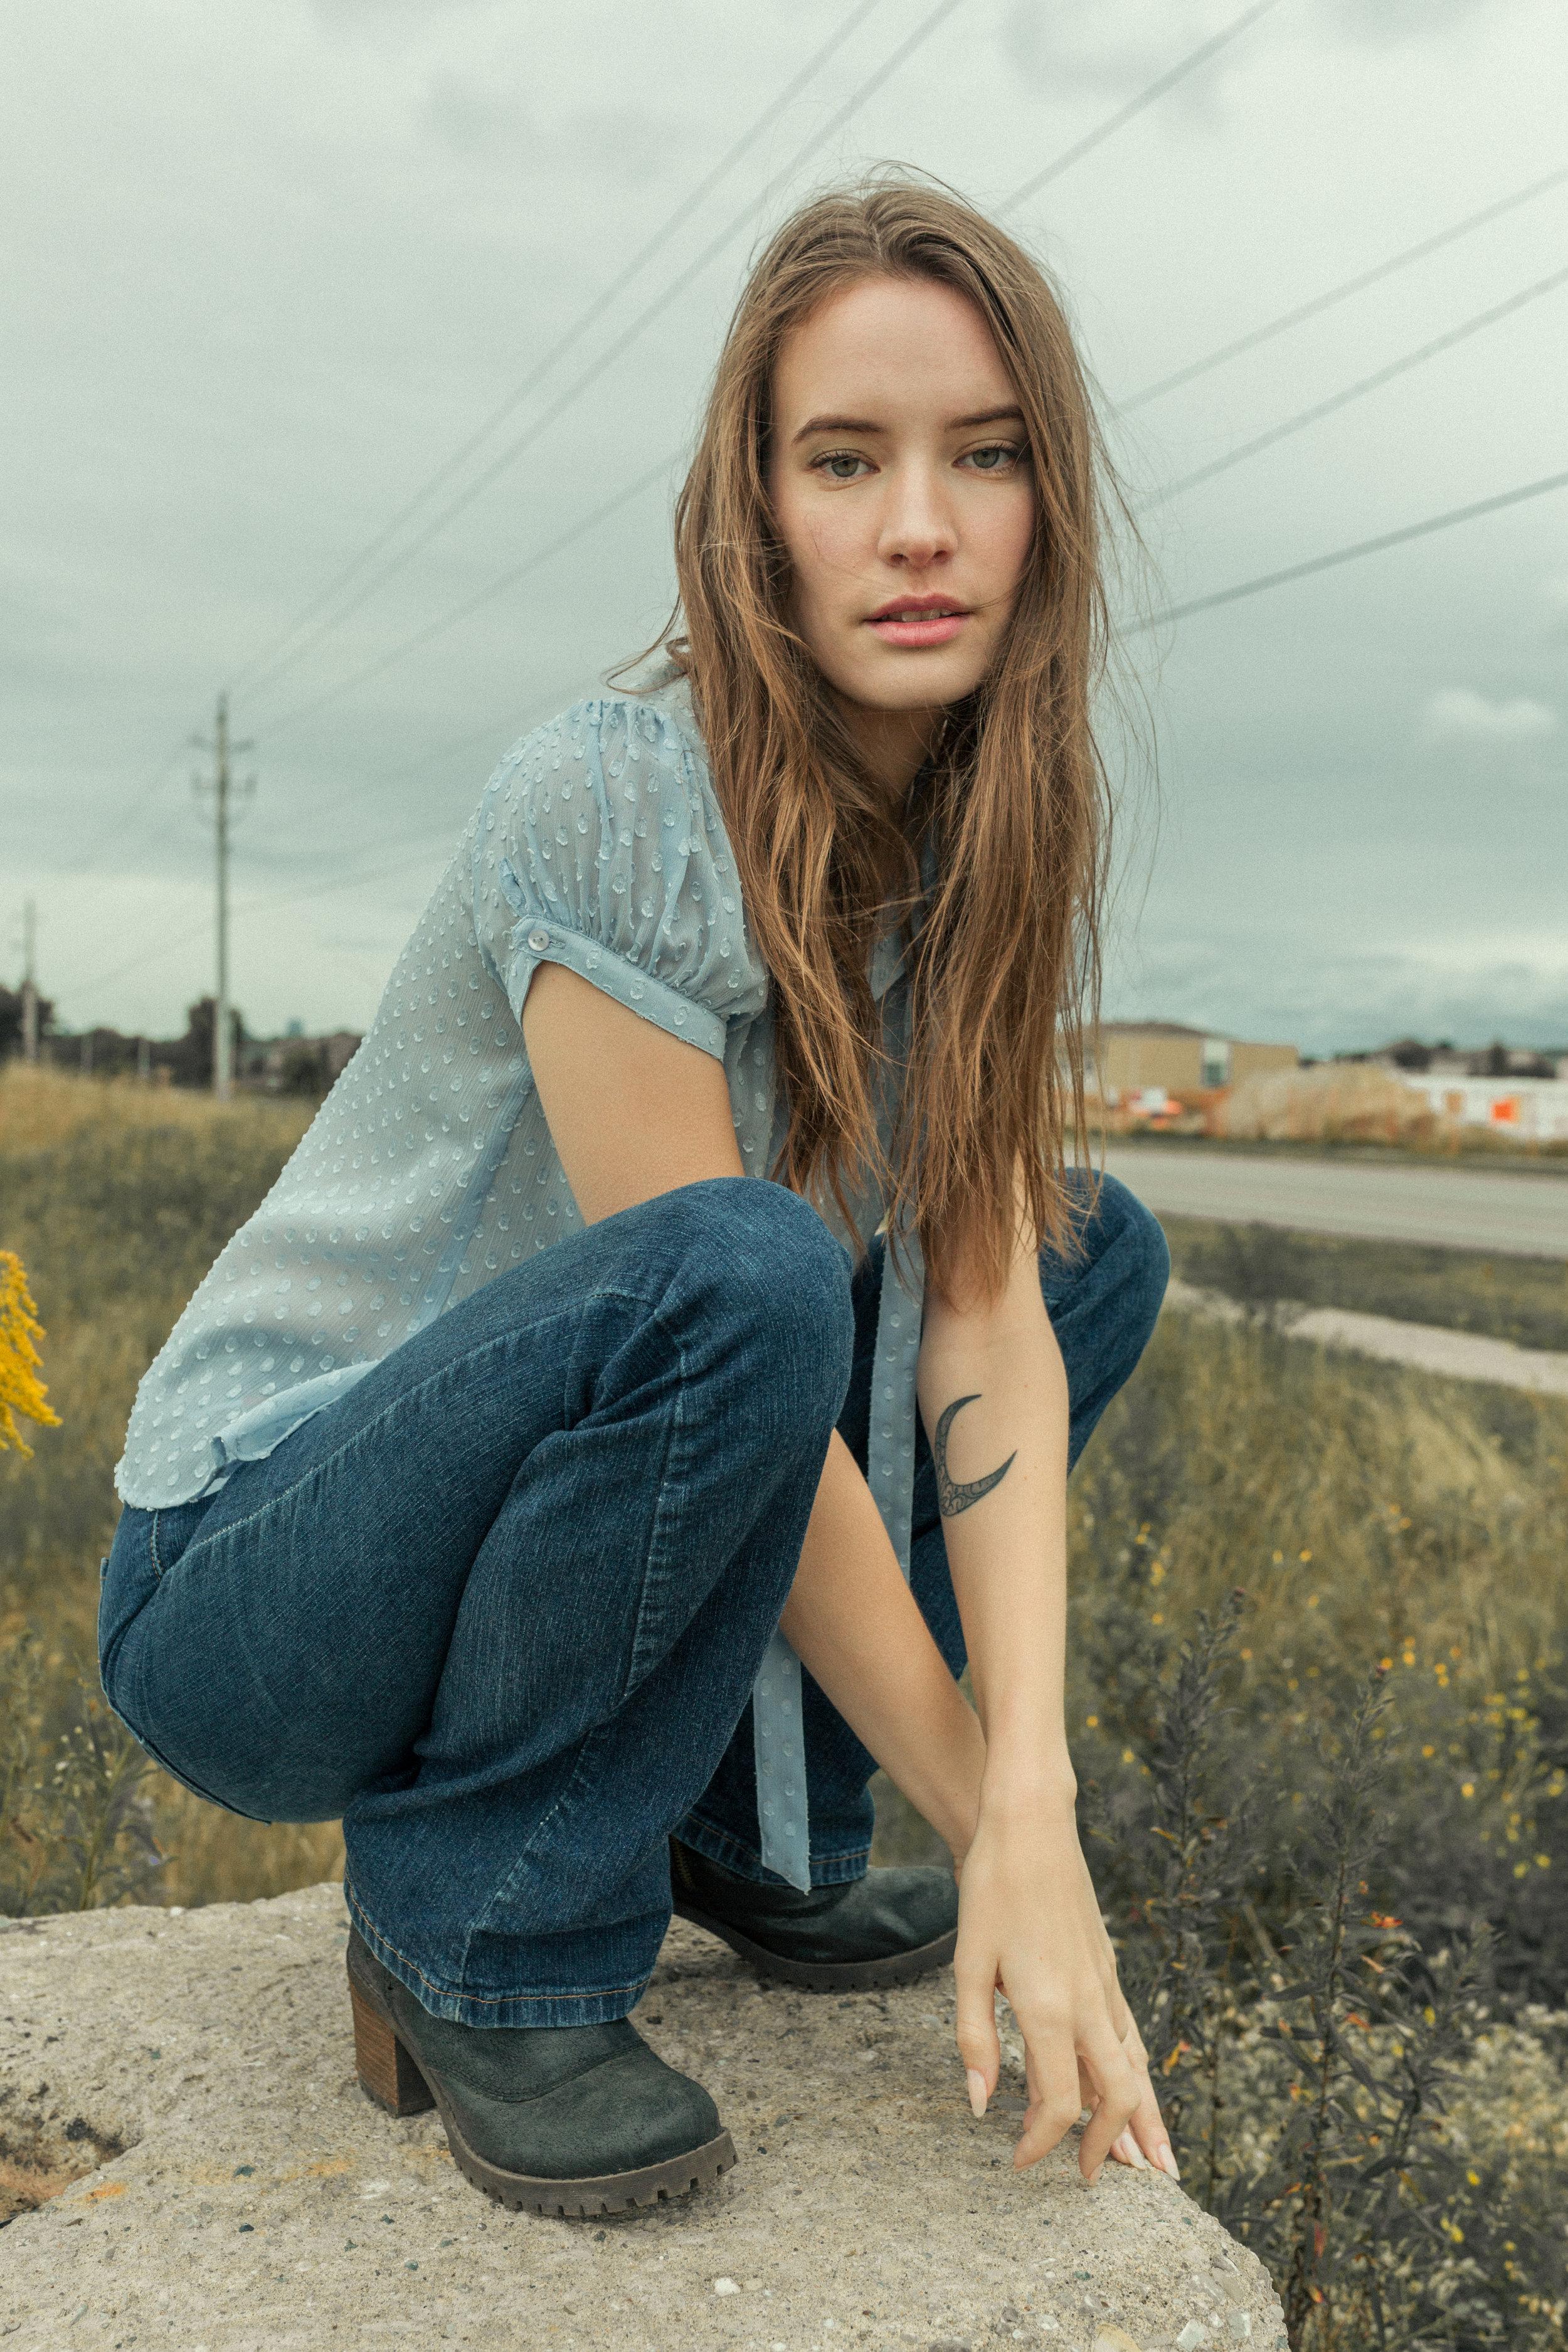 SofiaMaria_WinnieLu-15.jpg